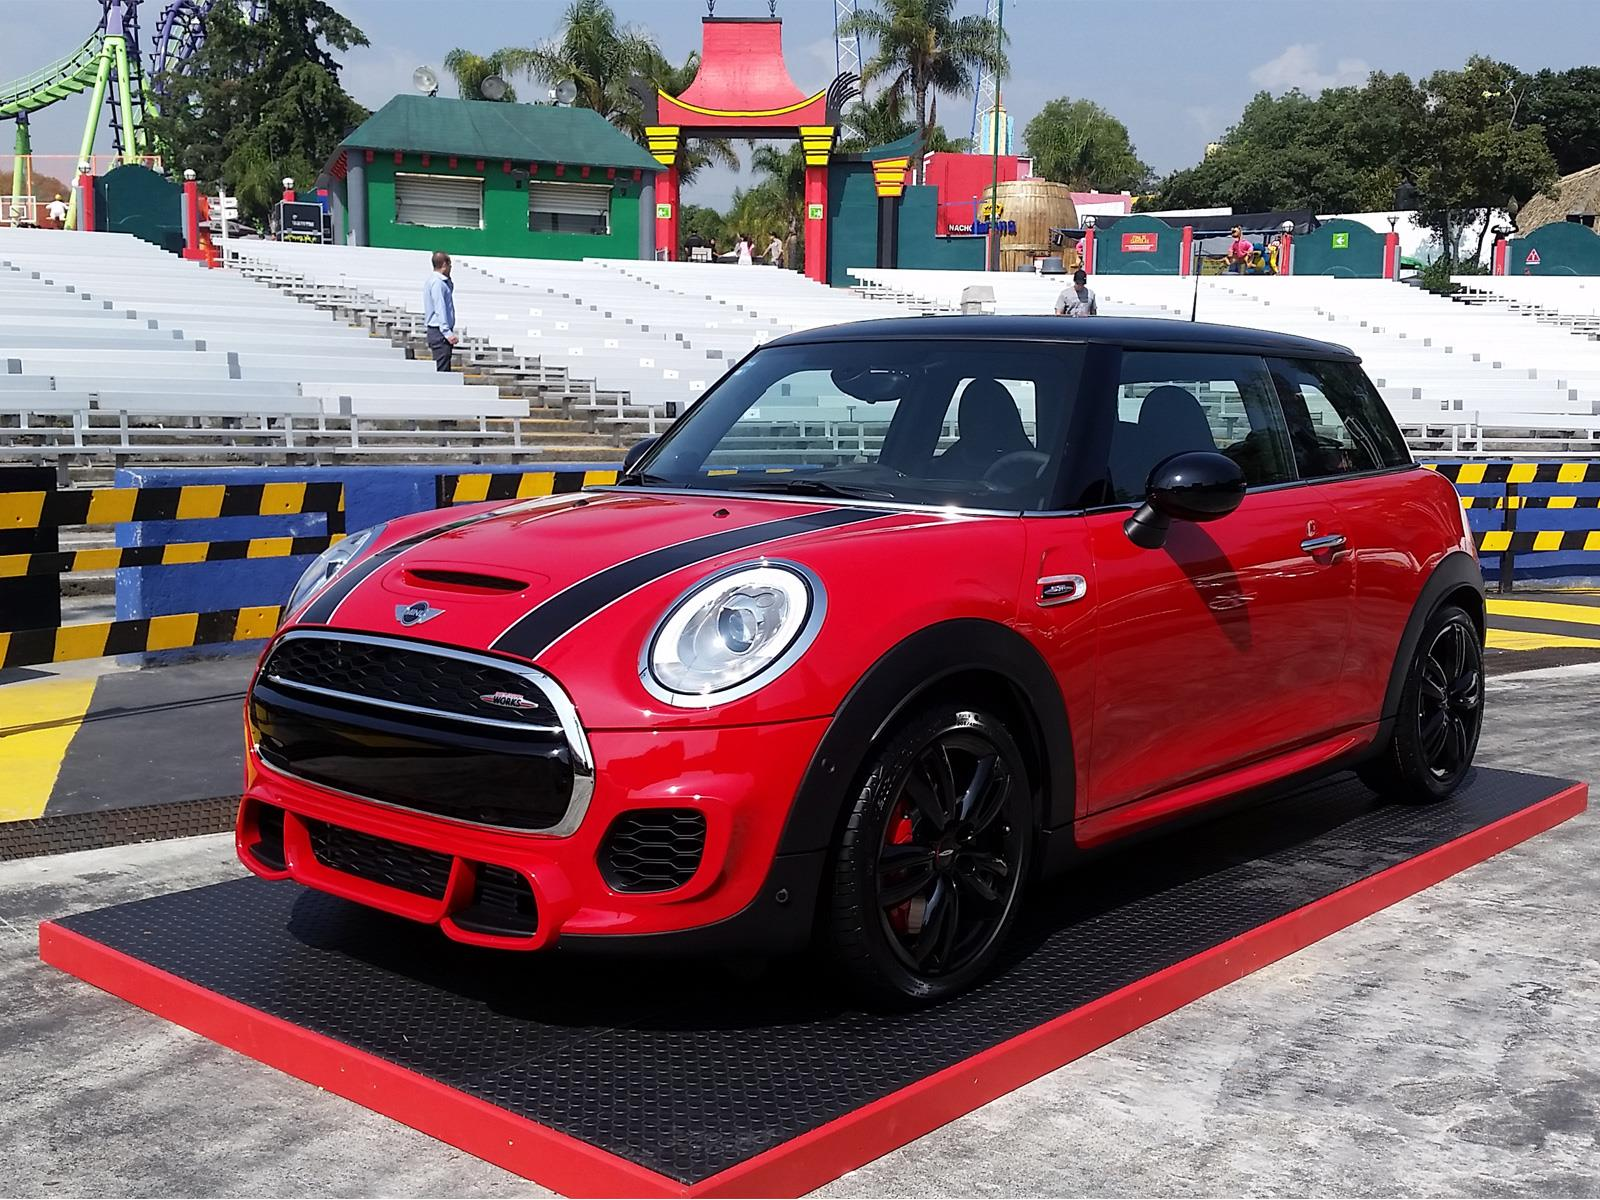 Mini Cooper Interior >> MINI John Cooper Works llega a México desde $480,000 pesos - Autocosmos.com